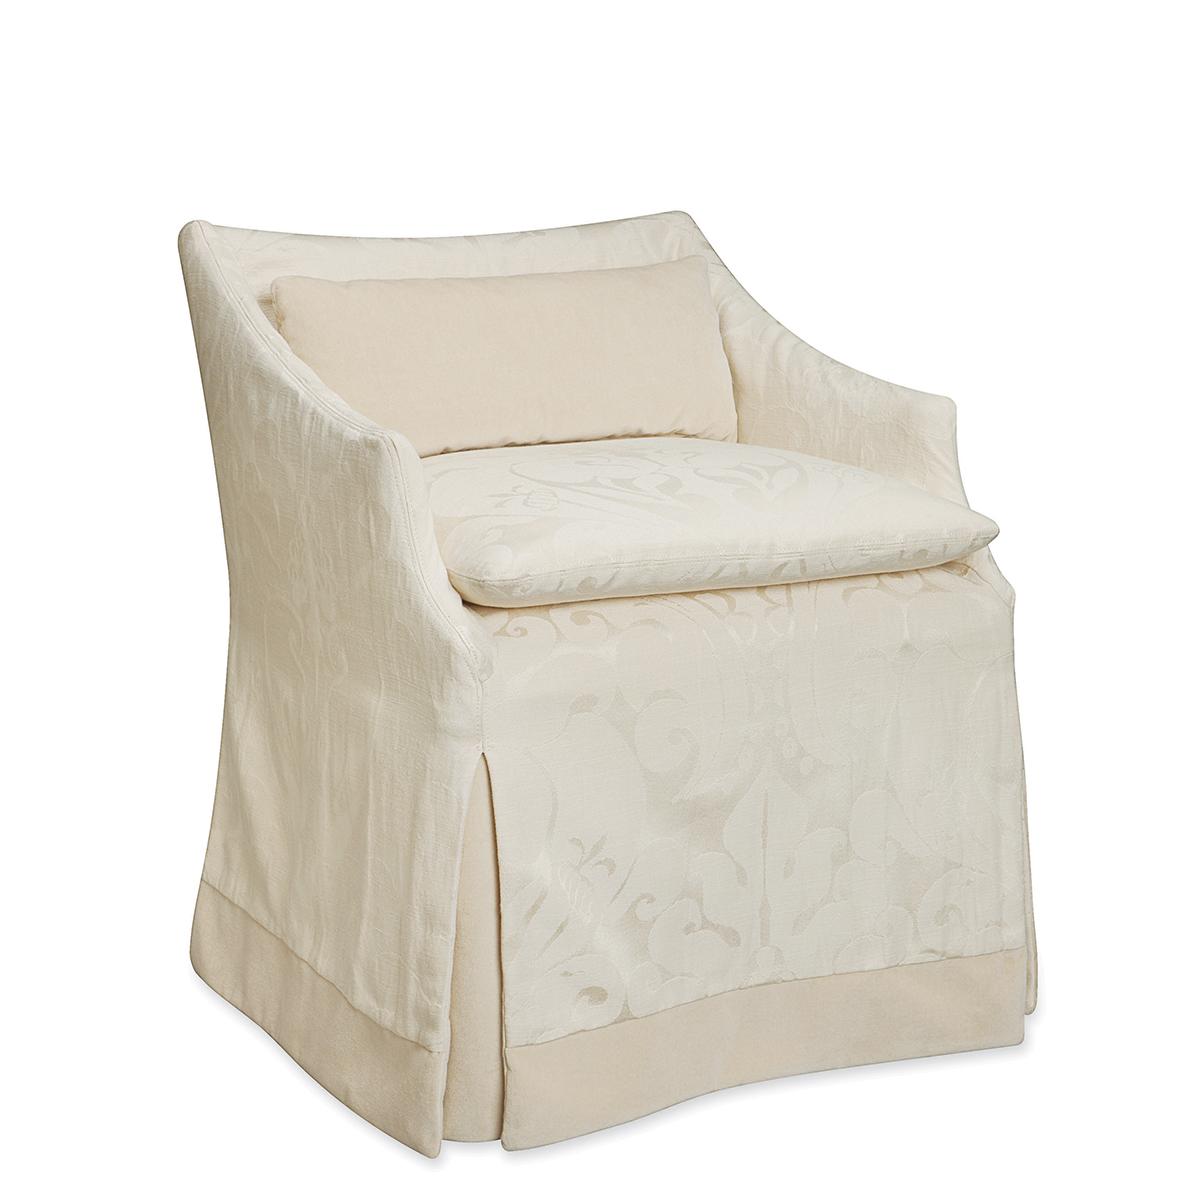 C5203-01_Lowback_Campaign_Chair_Lee_Industries.jpg